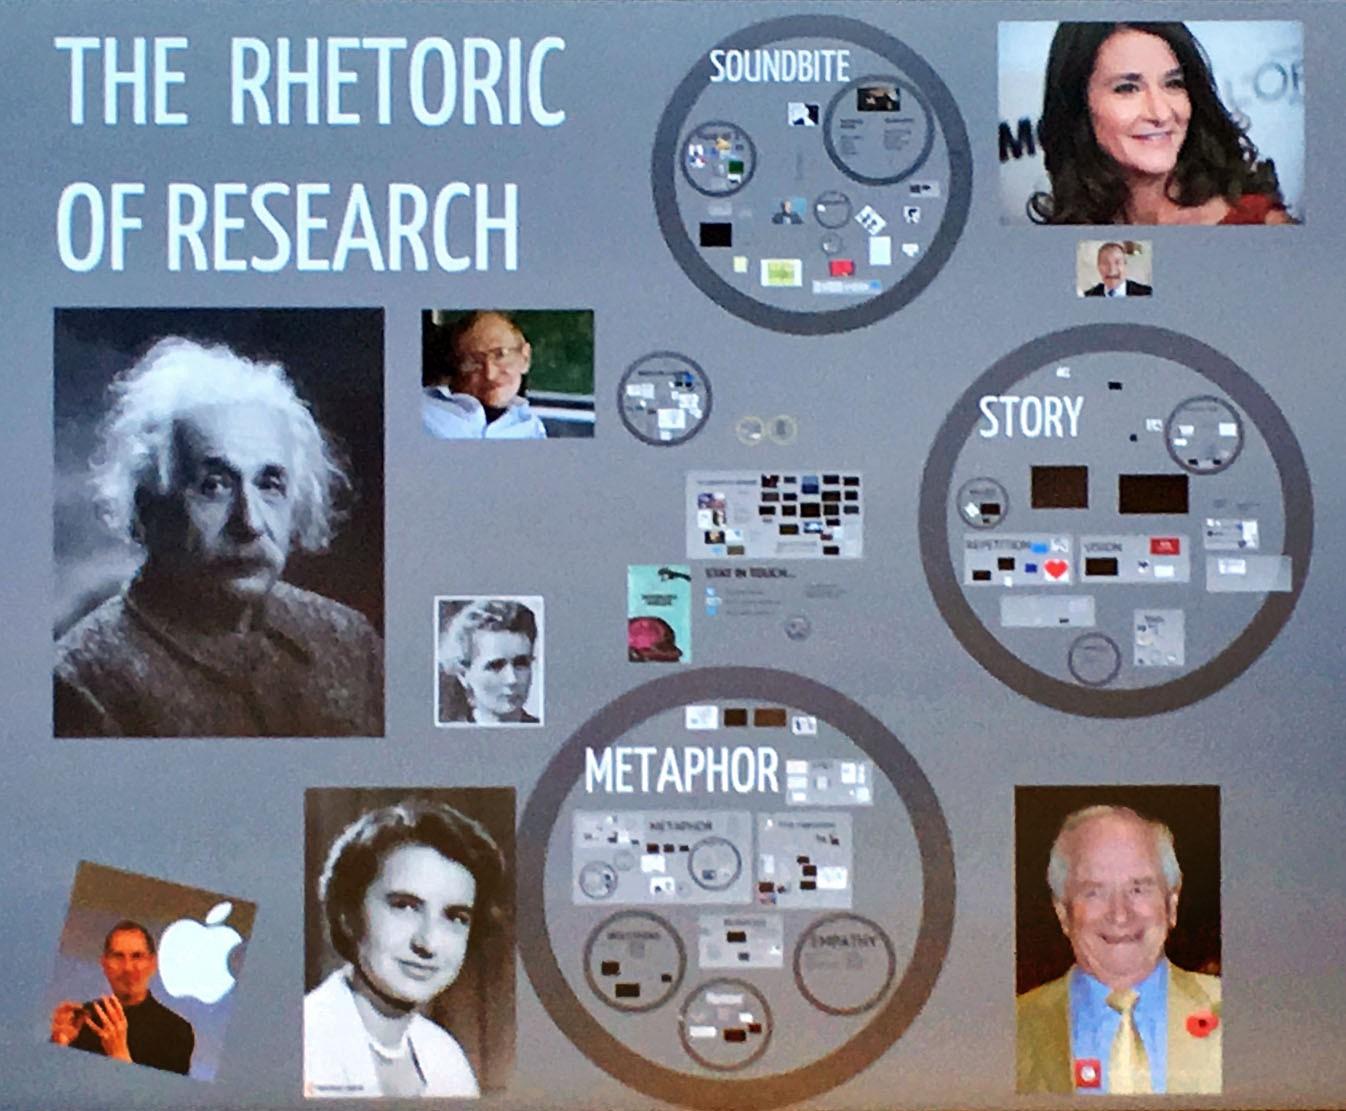 The Rhetoric of Research